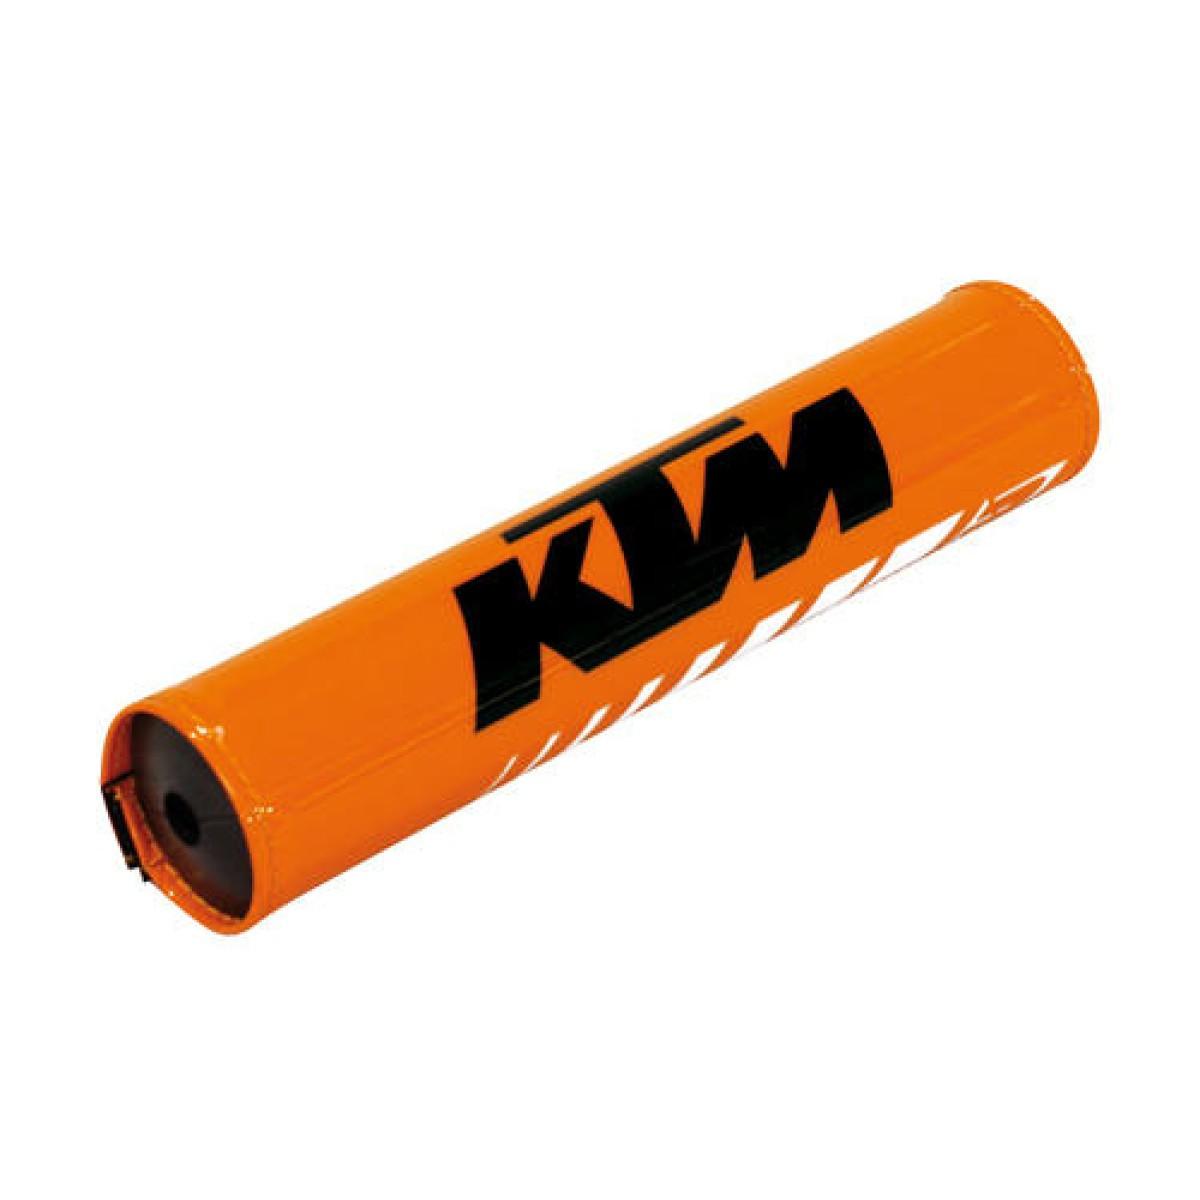 KTM Barhocker orange edelstahl KRA3400003